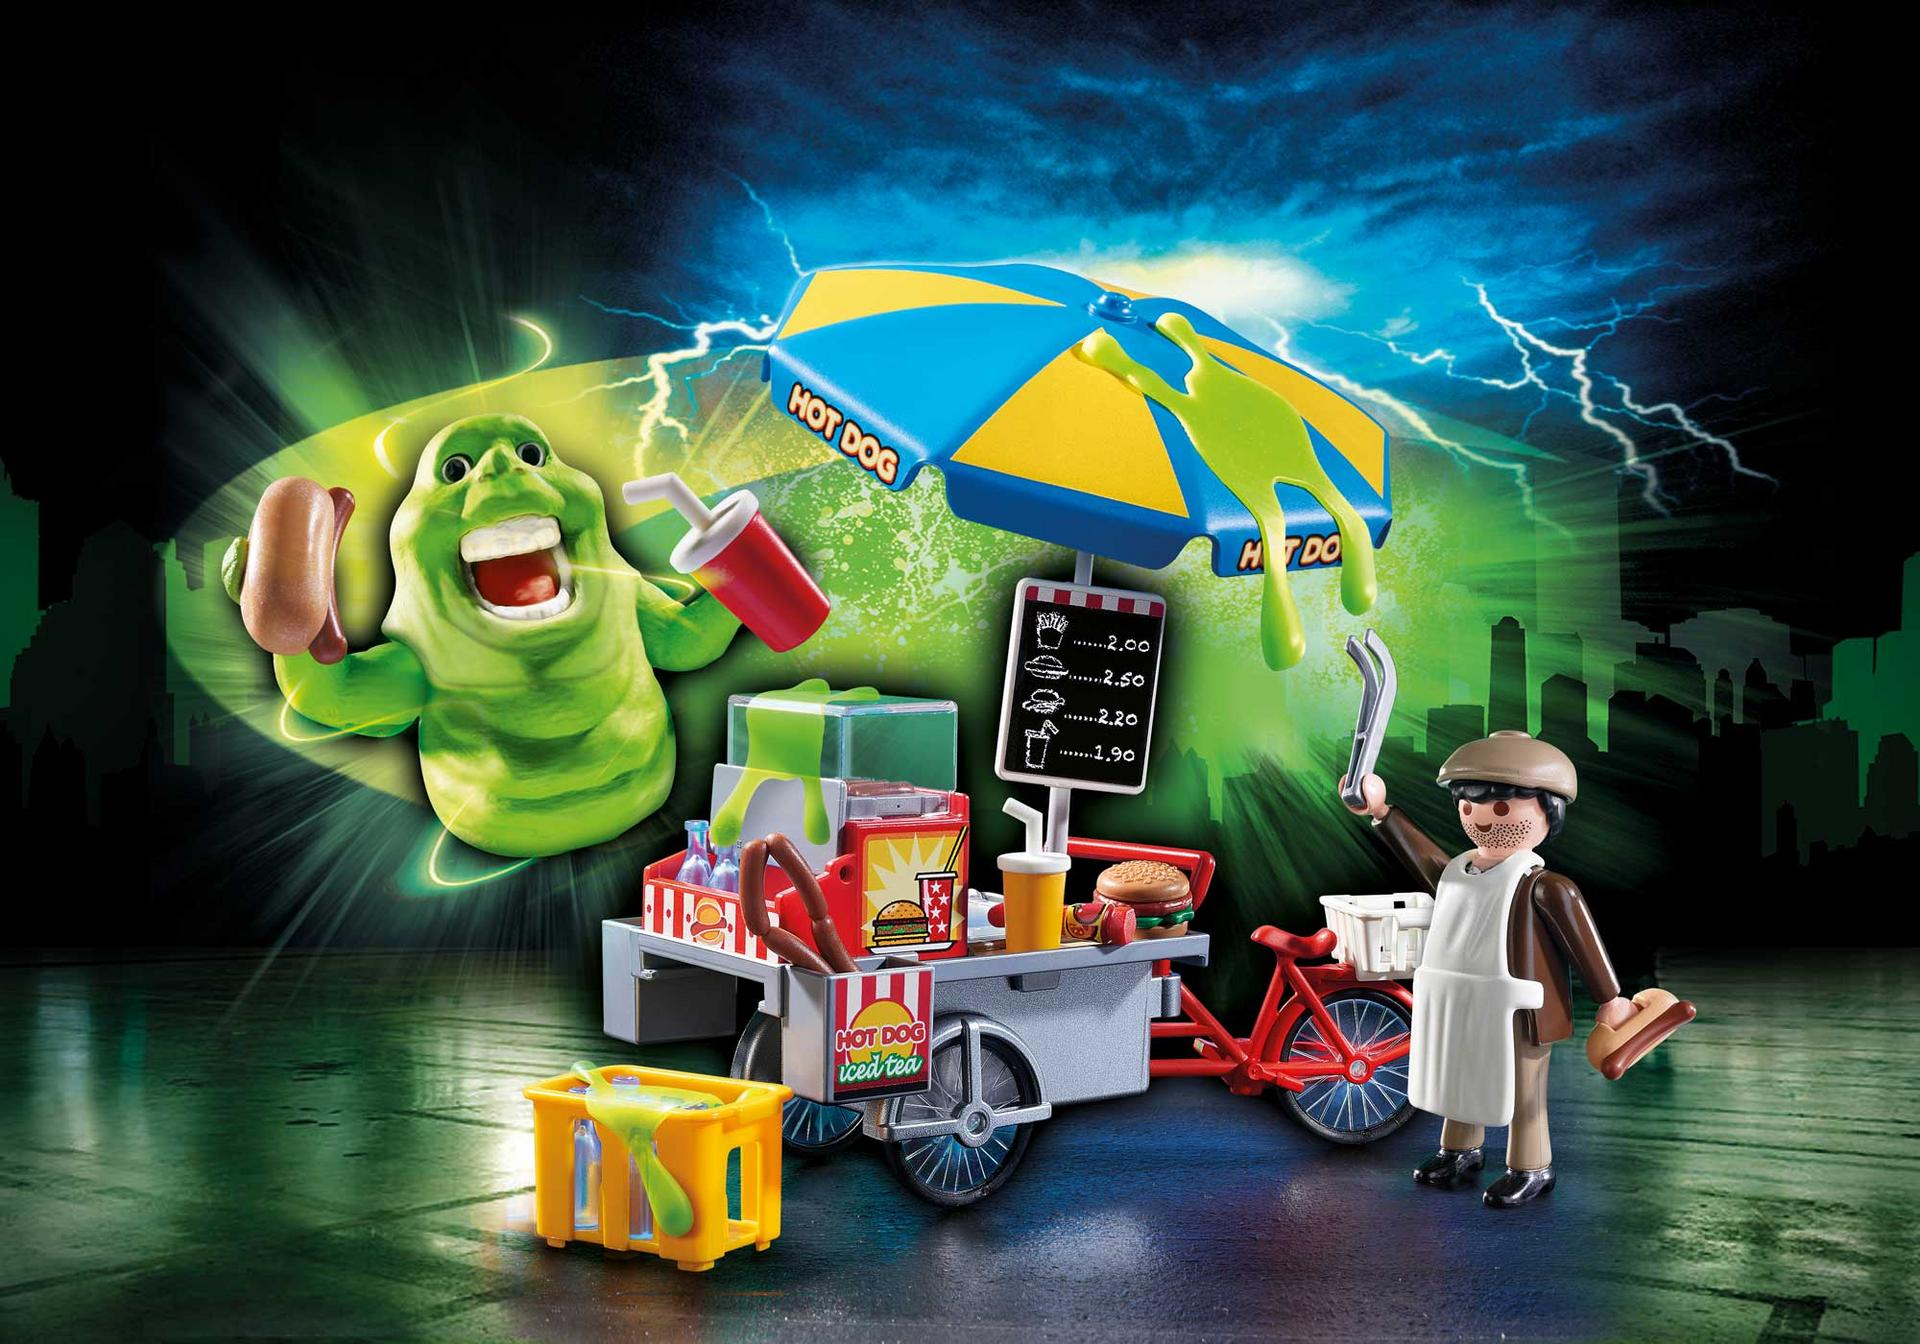 Ausmalbilder Playmobil Drachenburg : Elegant Playmobil Ausmalbilder Shopping Center Art Von Malvorlagen